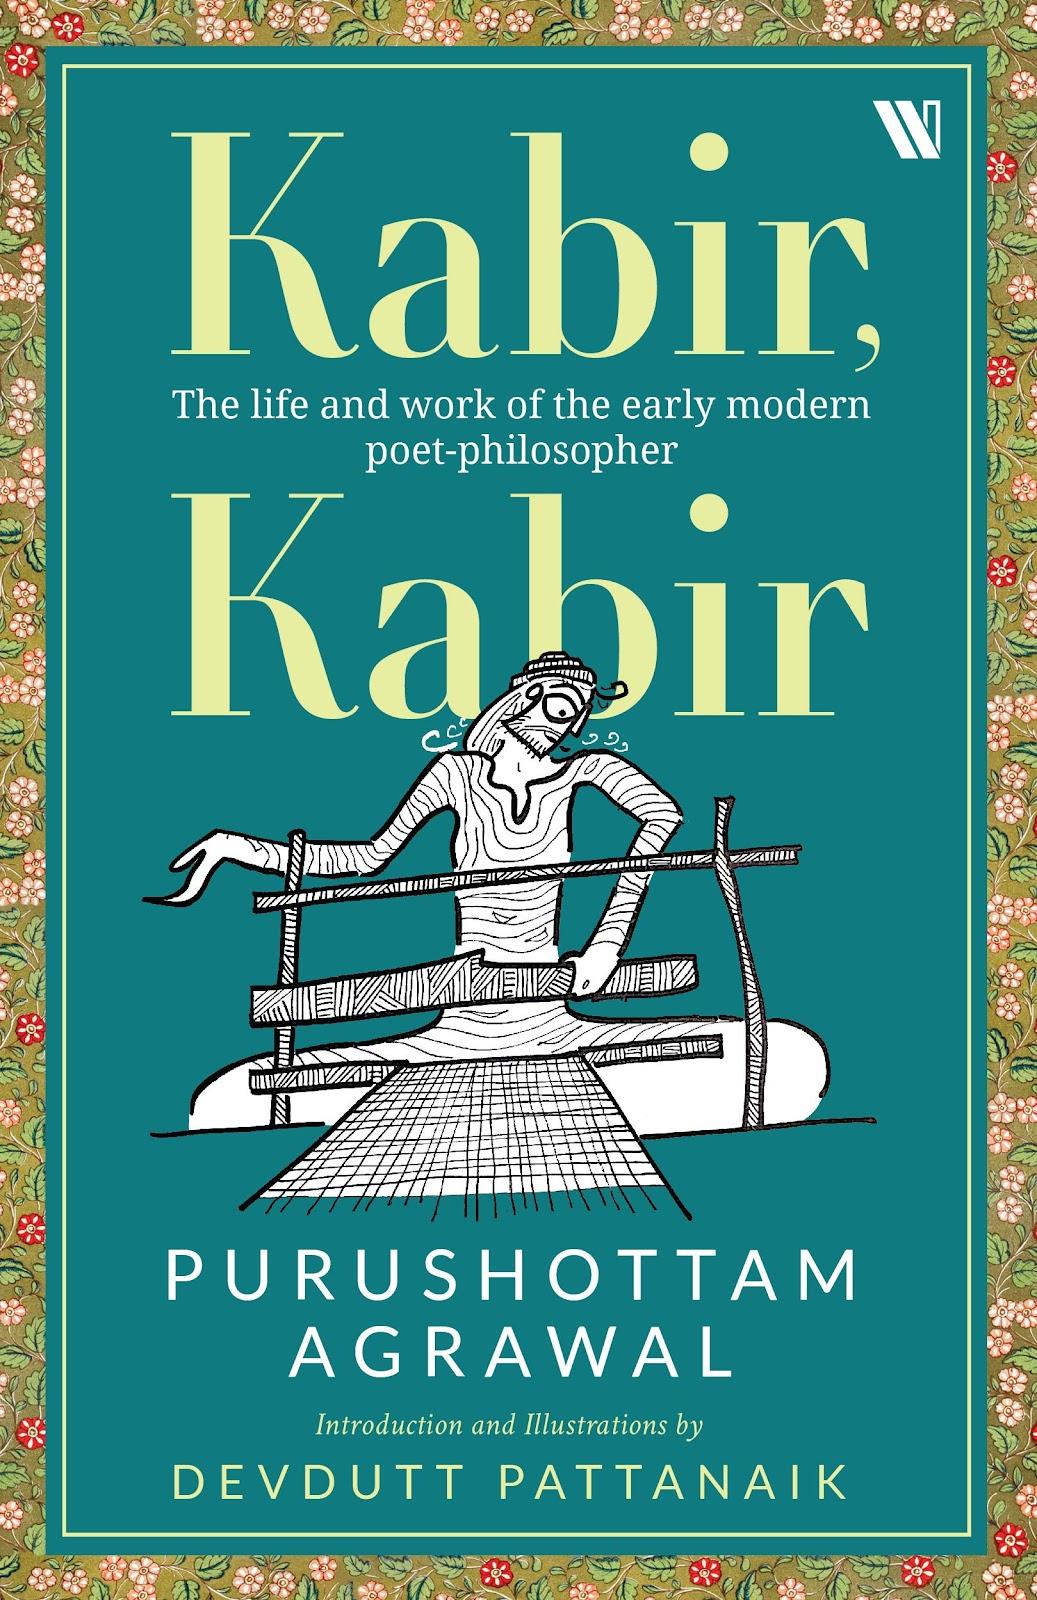 Buy Kabir, Kabir: The life and work of the early modern poet-philosopher  Book Online at Low Prices in India | Kabir, Kabir: The life and work of the  early modern poet-philosopher Reviews